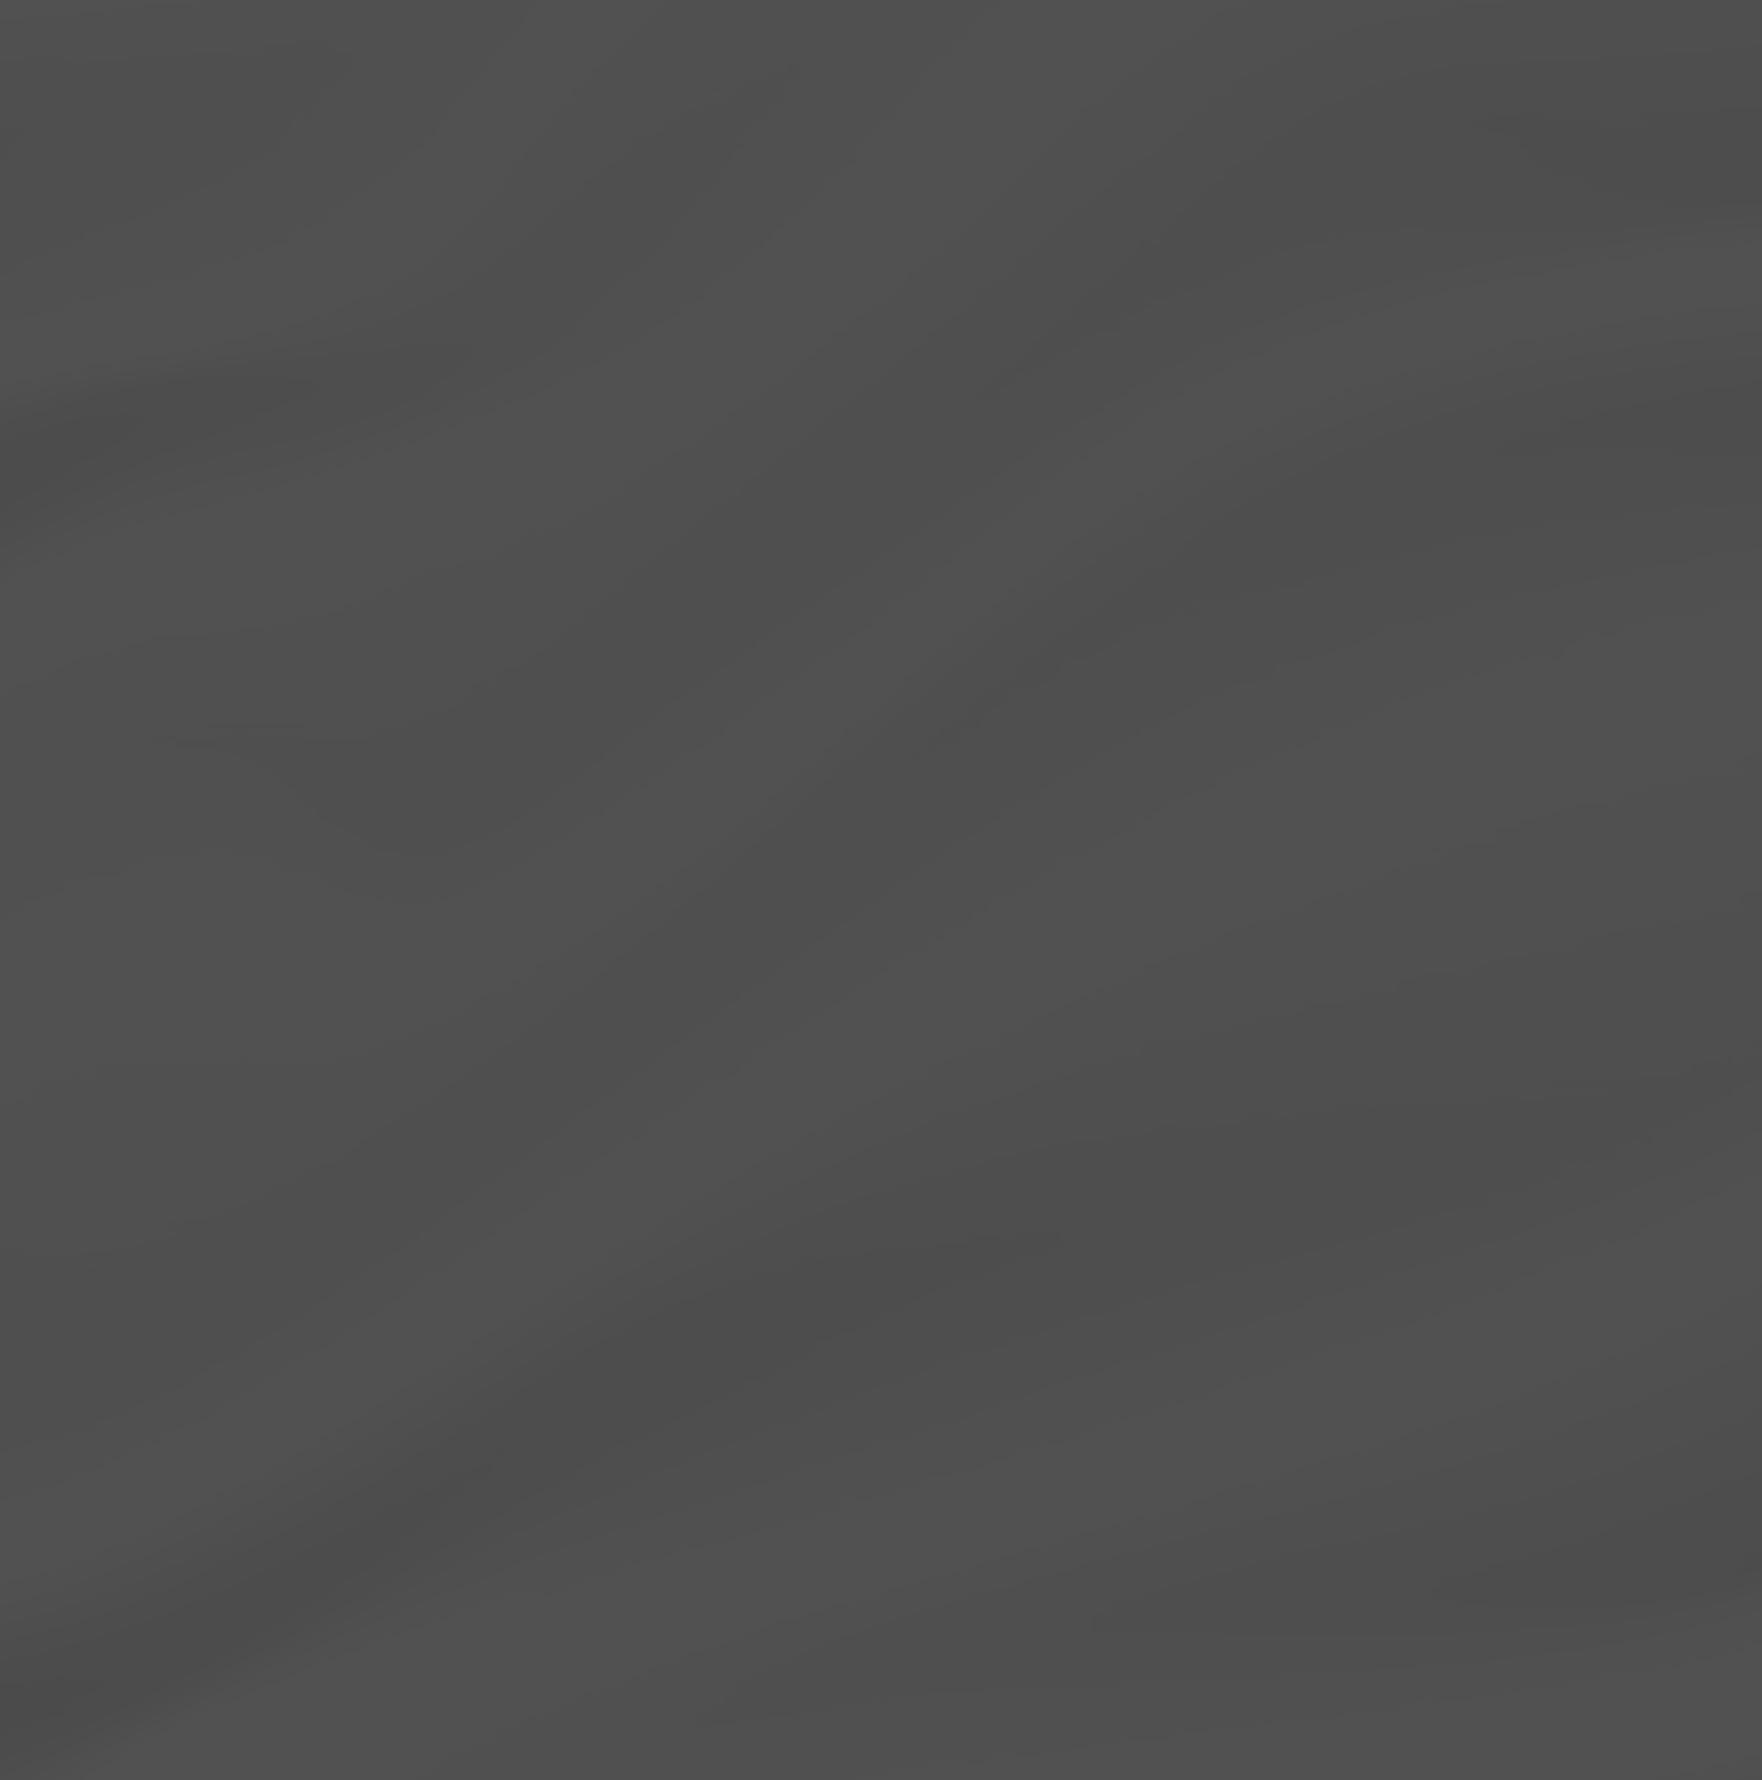 LISOX-907-TRICOLINE IPANEMA 100% ALGODAO CINZA